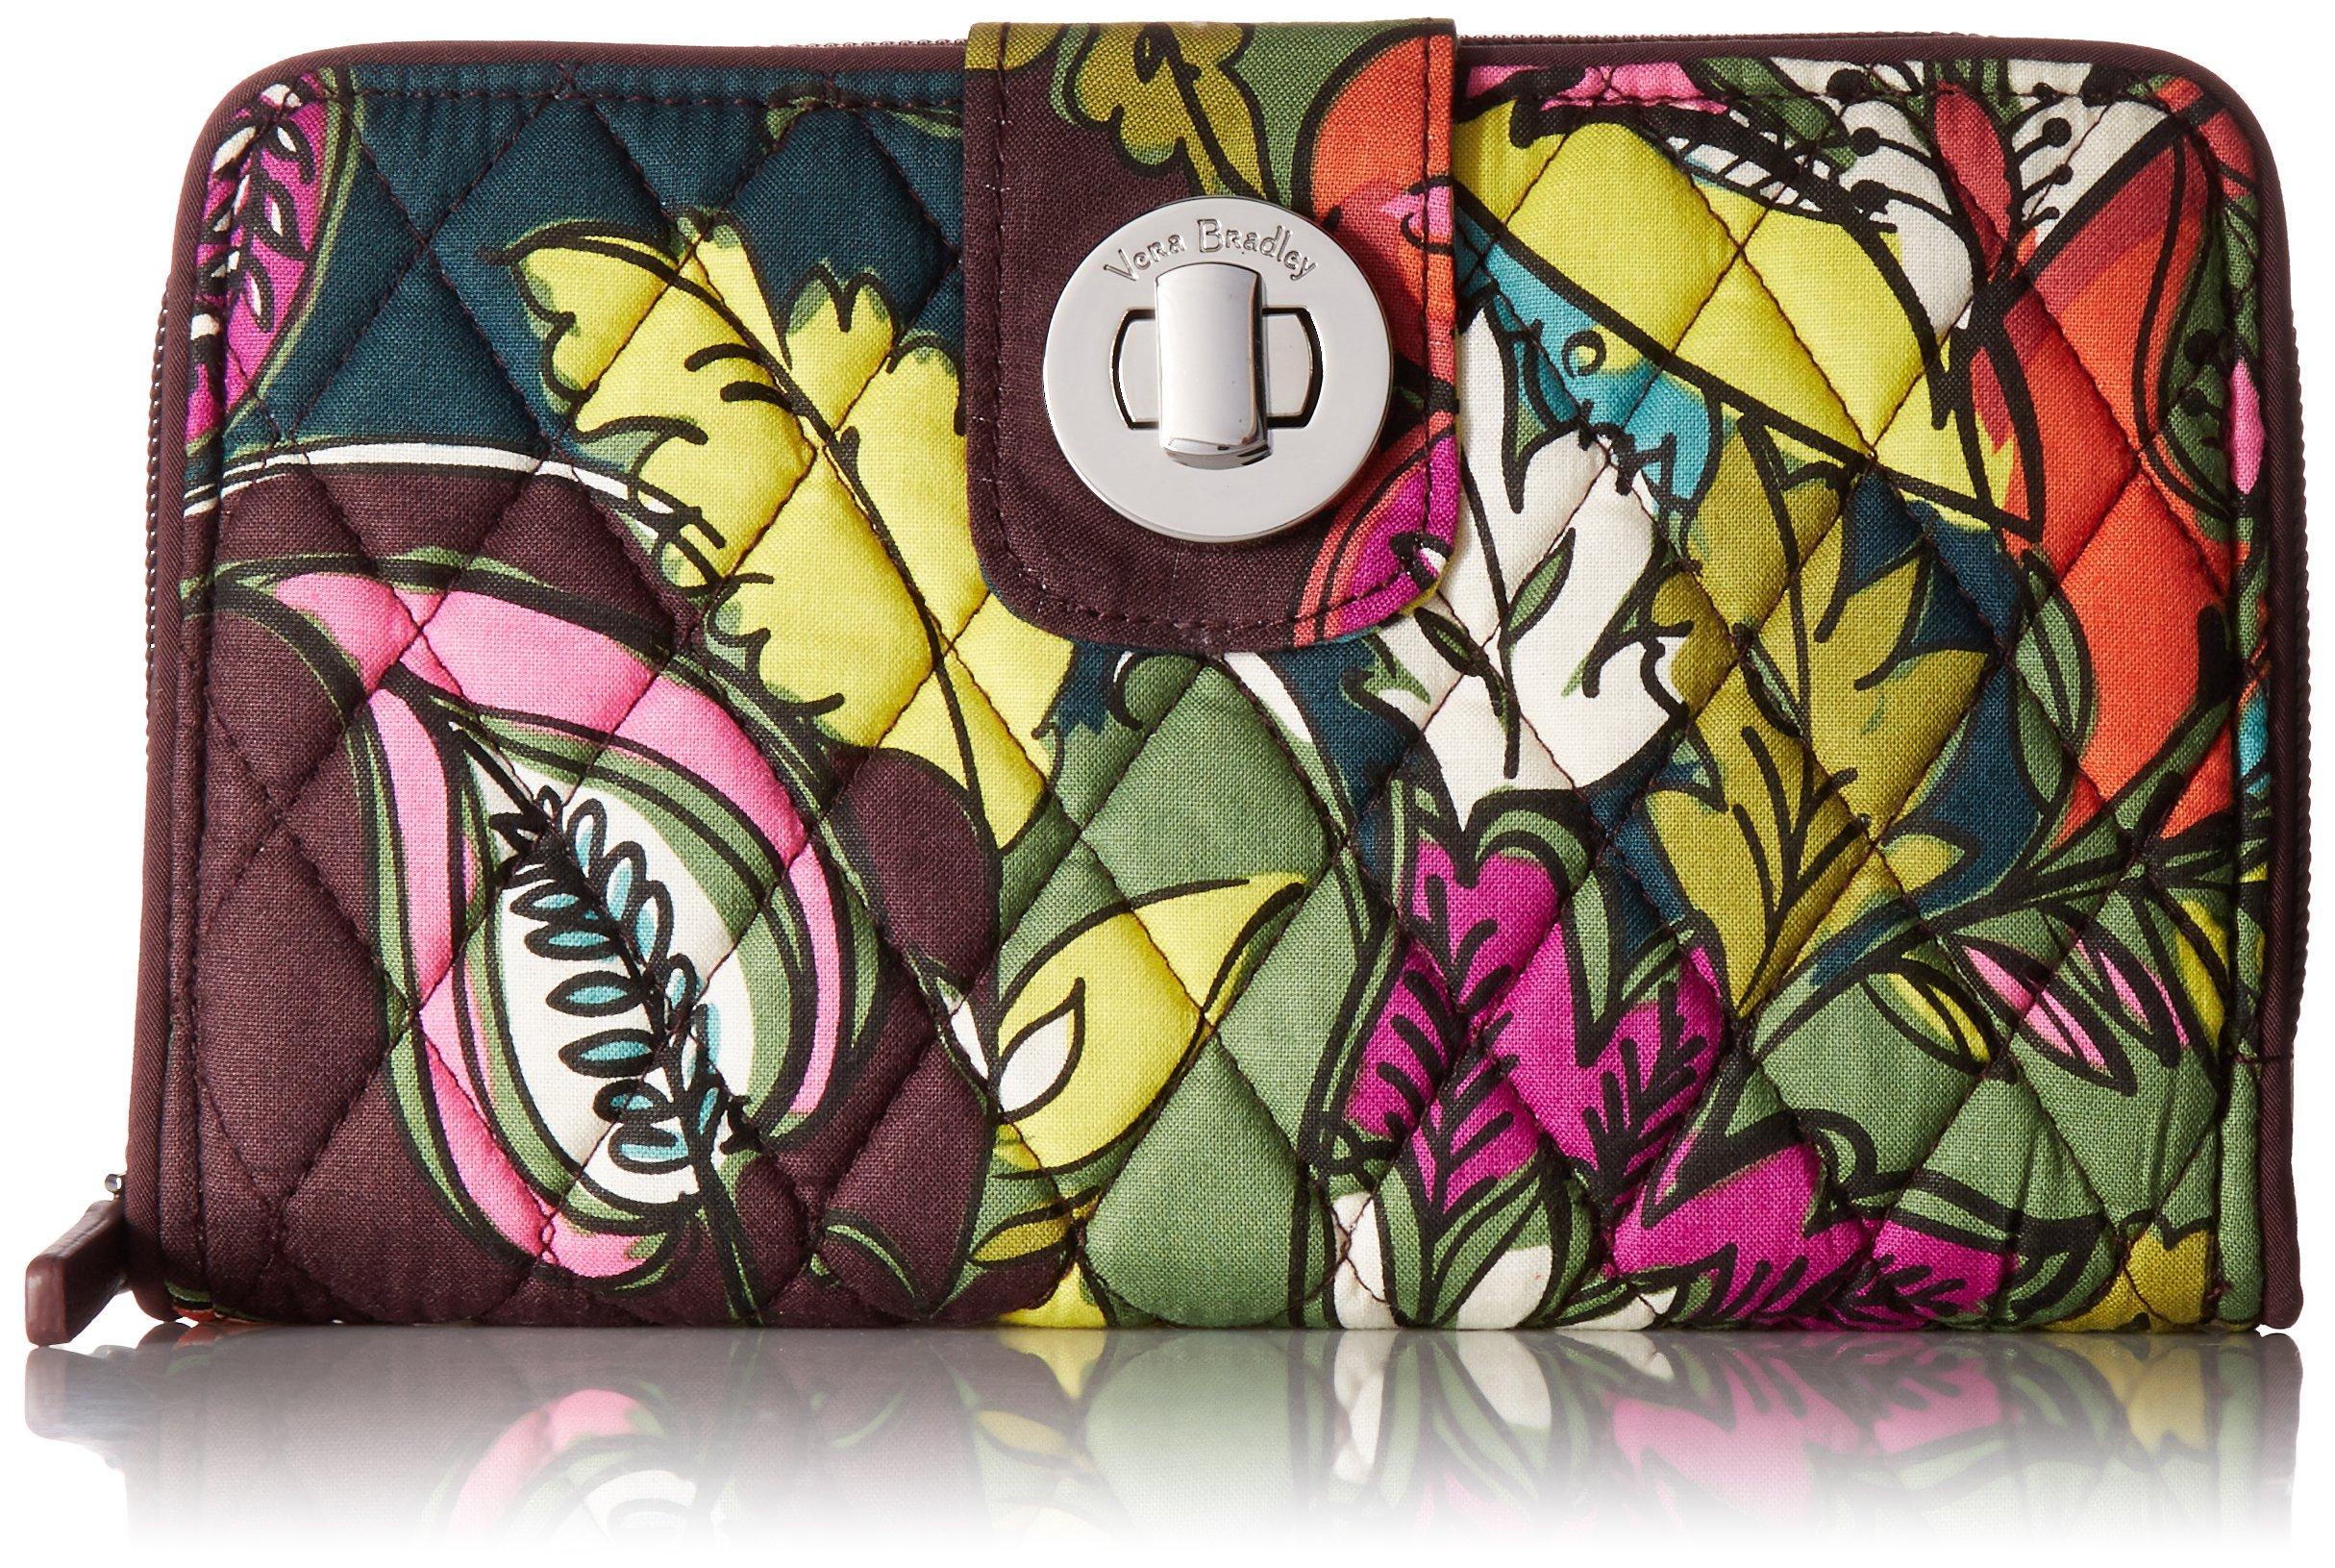 Vera Bradley Women's Rfid Turnlock Wallet, Autumn Leaves, One Size